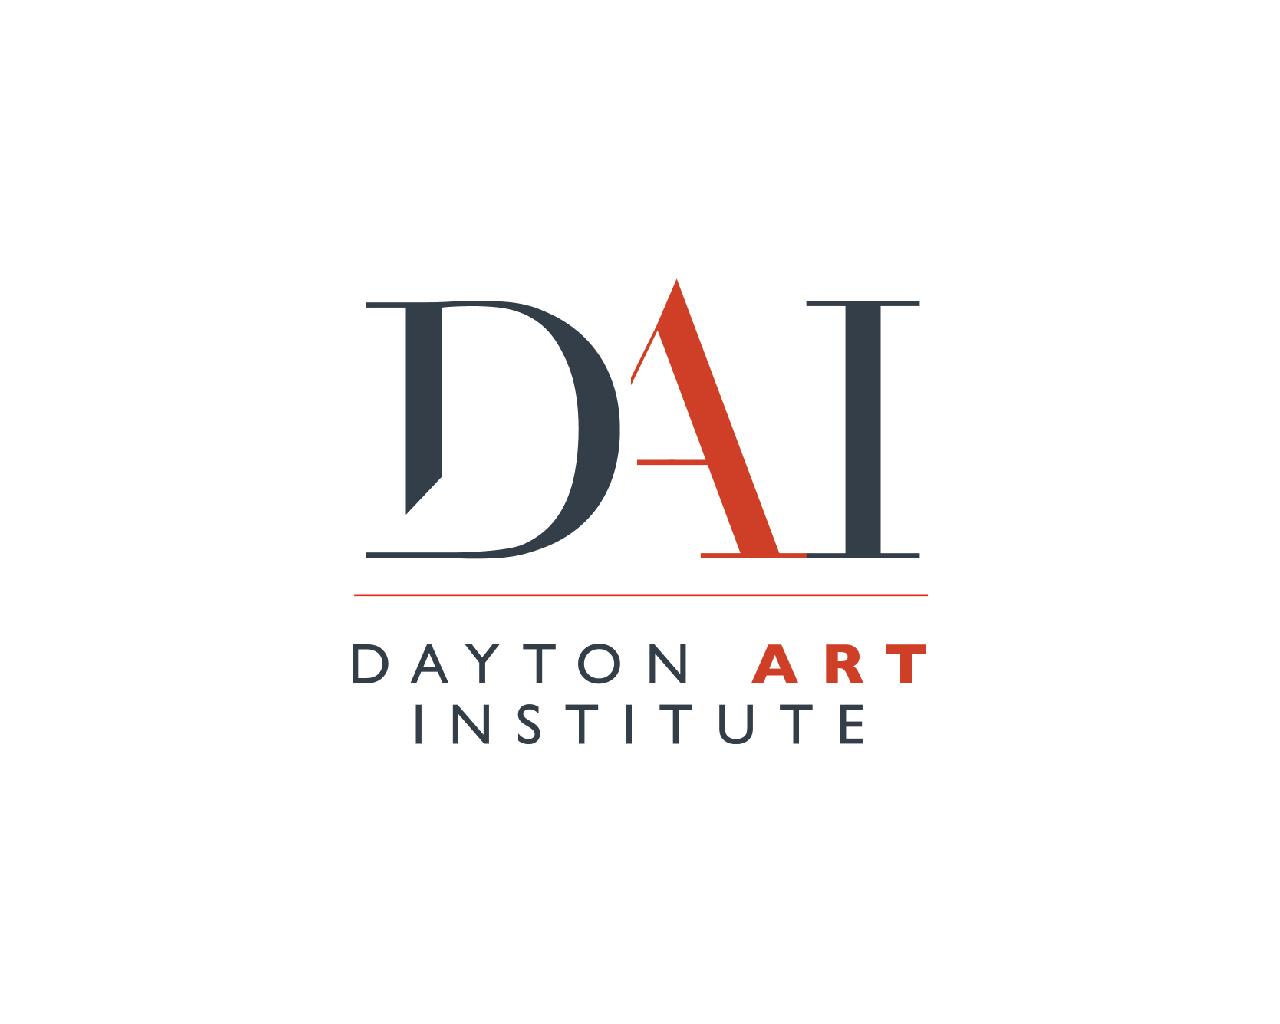 DAYTON ART INSTITUTE